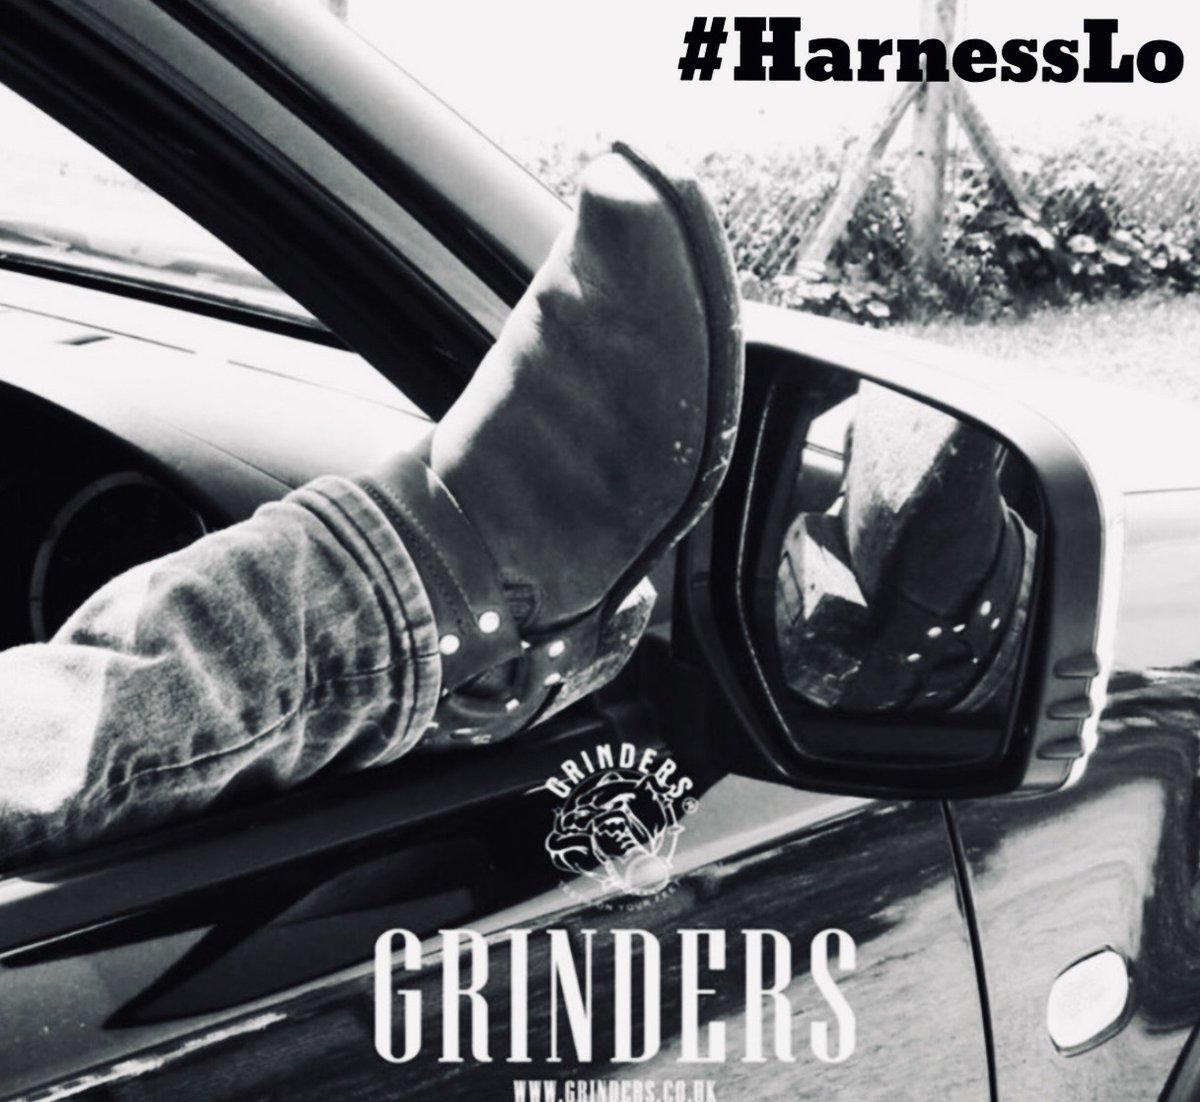 GrindersUK photo